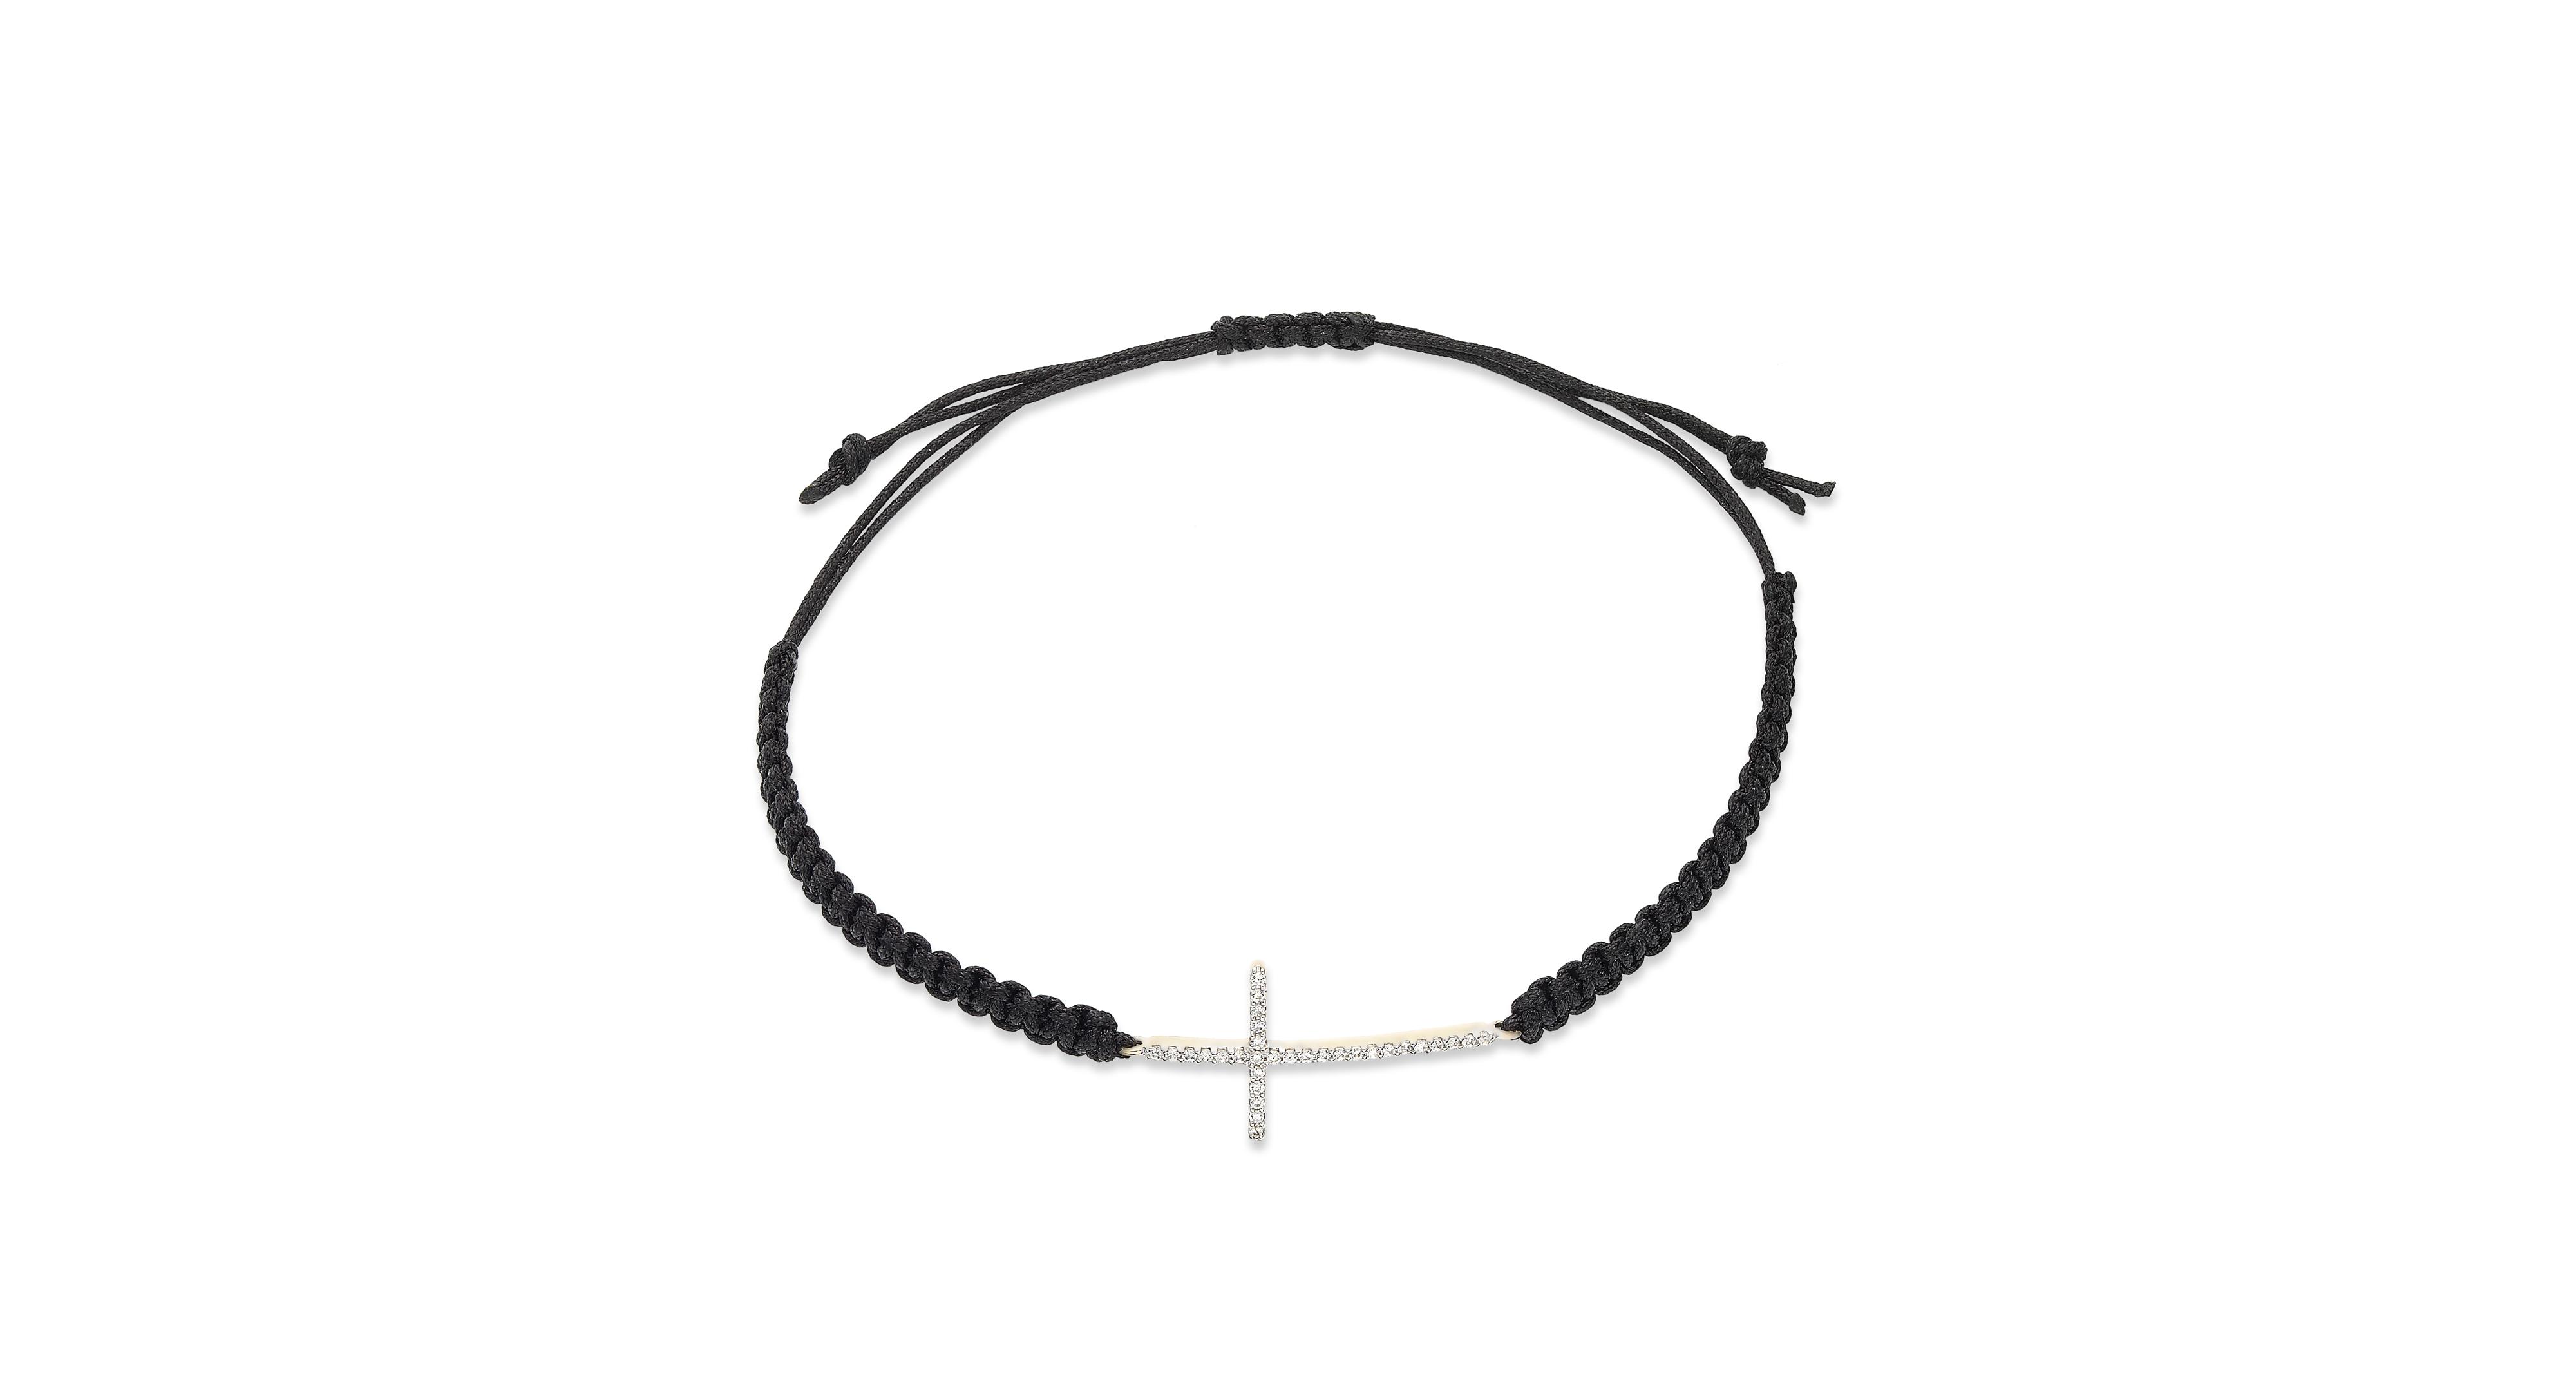 Diamond cross parachute cord bracelet in ct tw parachute